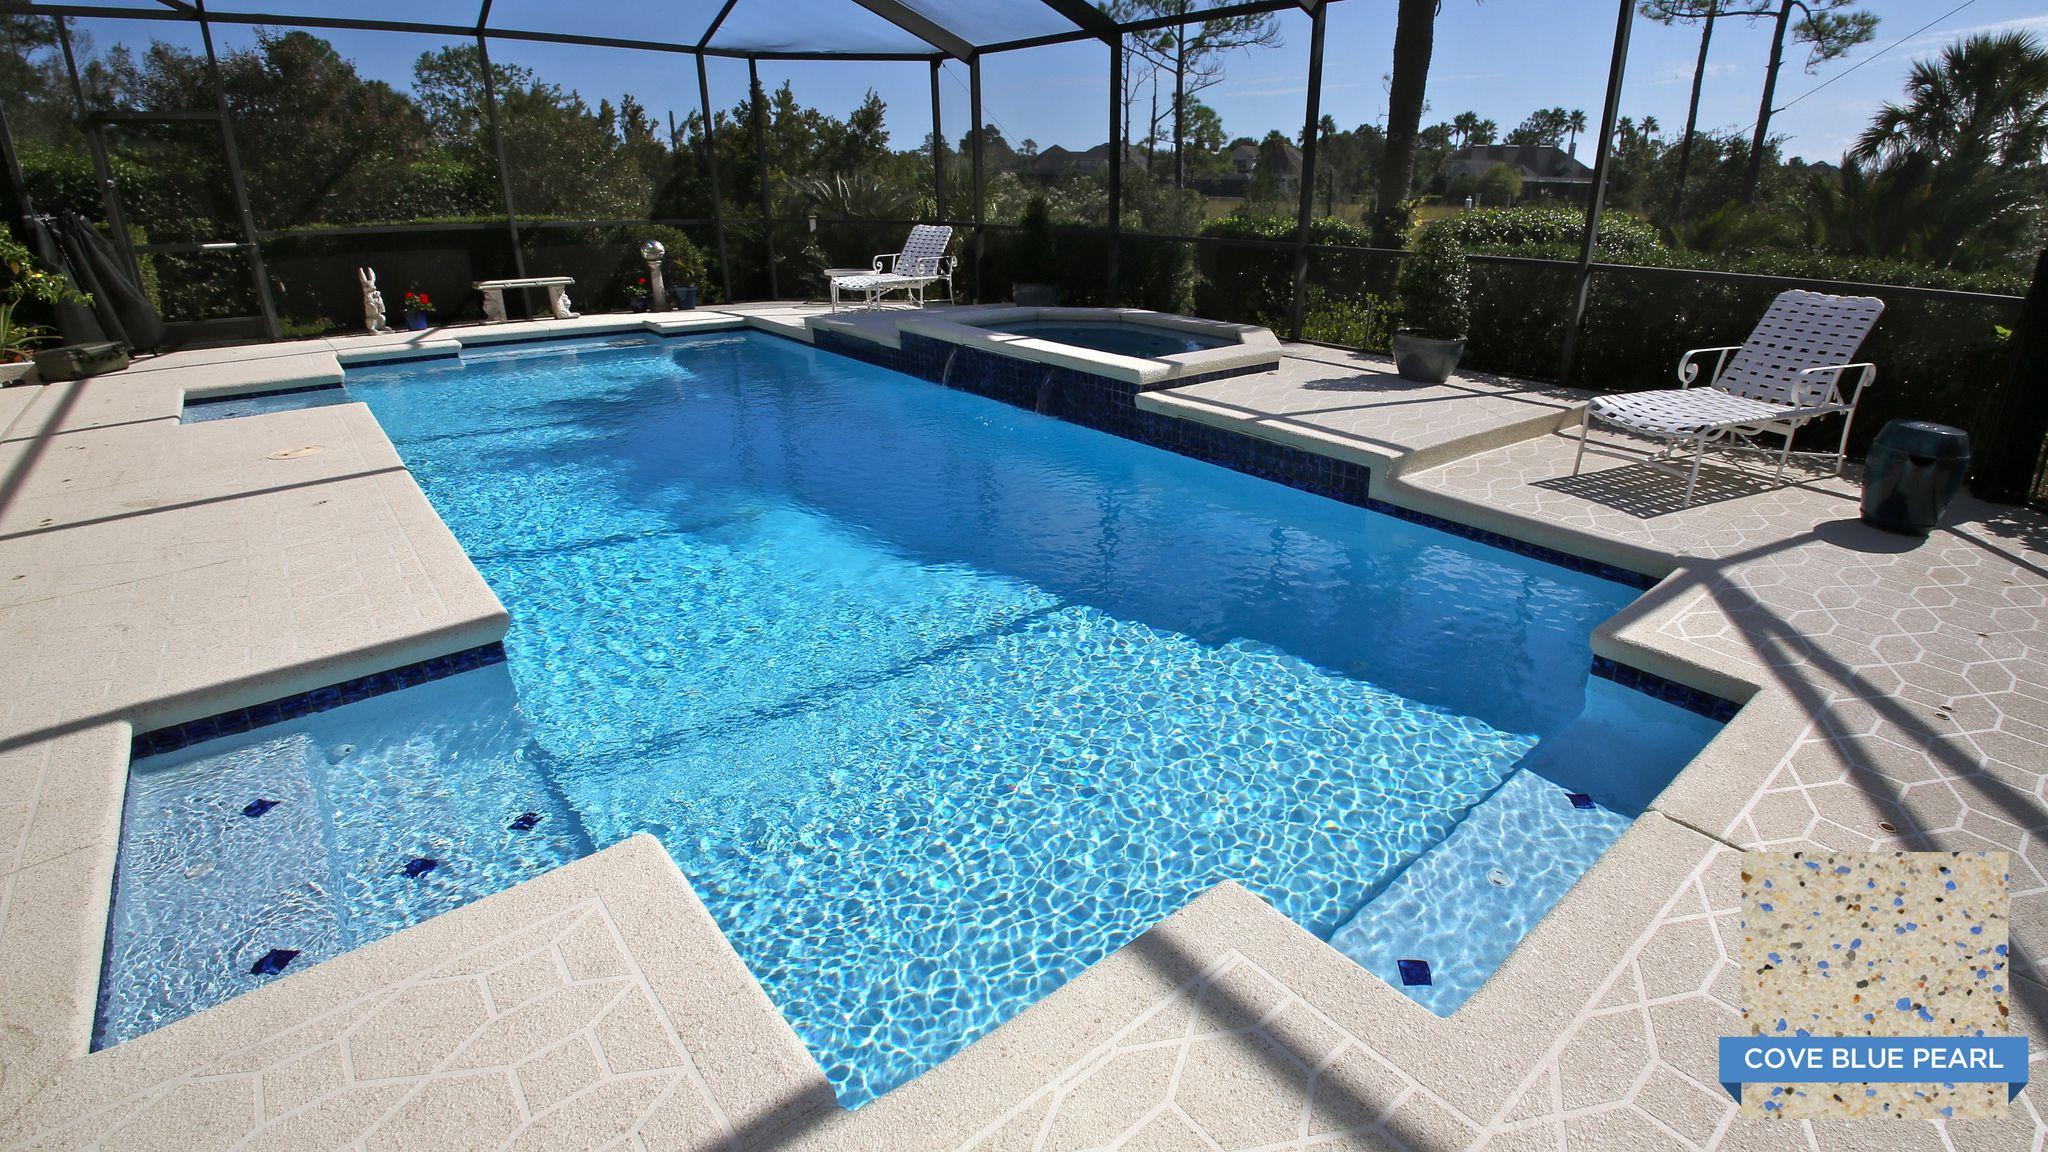 Sunstone Pearl Cove Blue even looks great in backyard